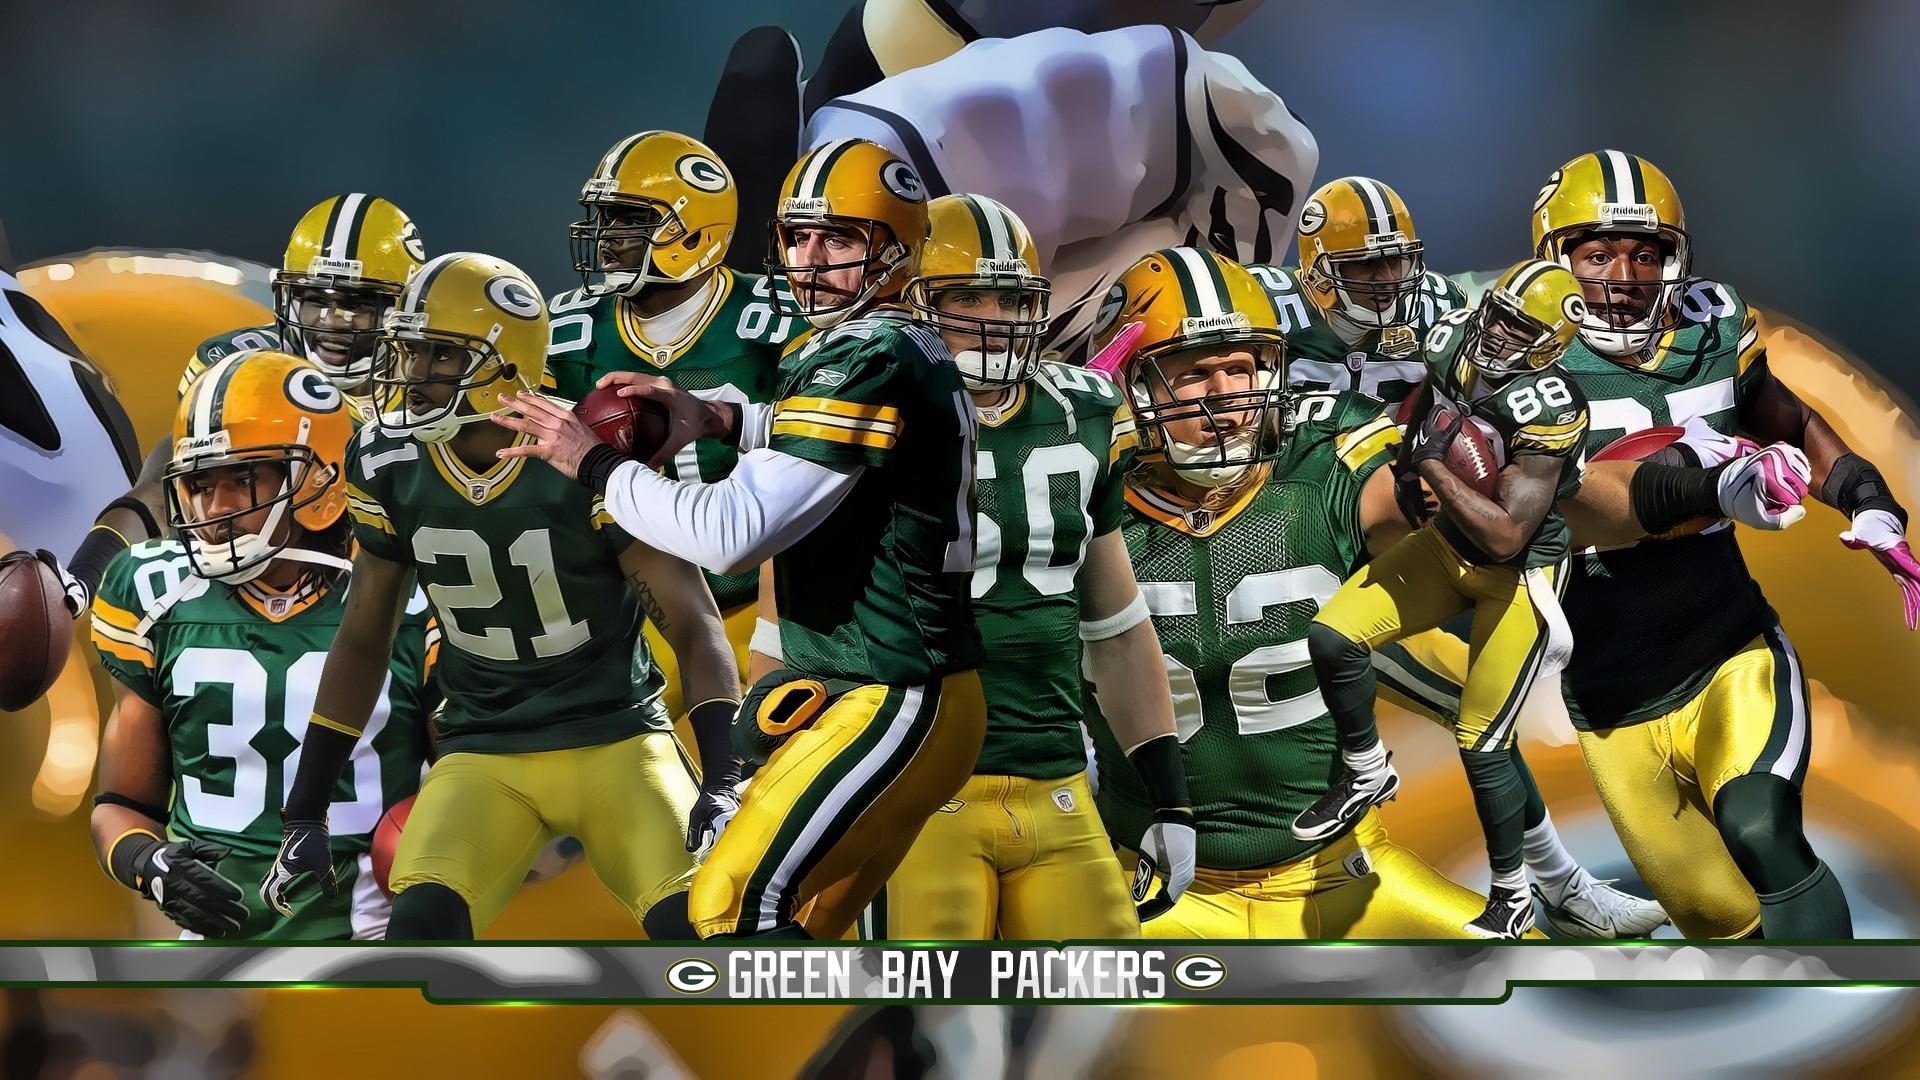 Green Bay Packers Desktop Wallpaper